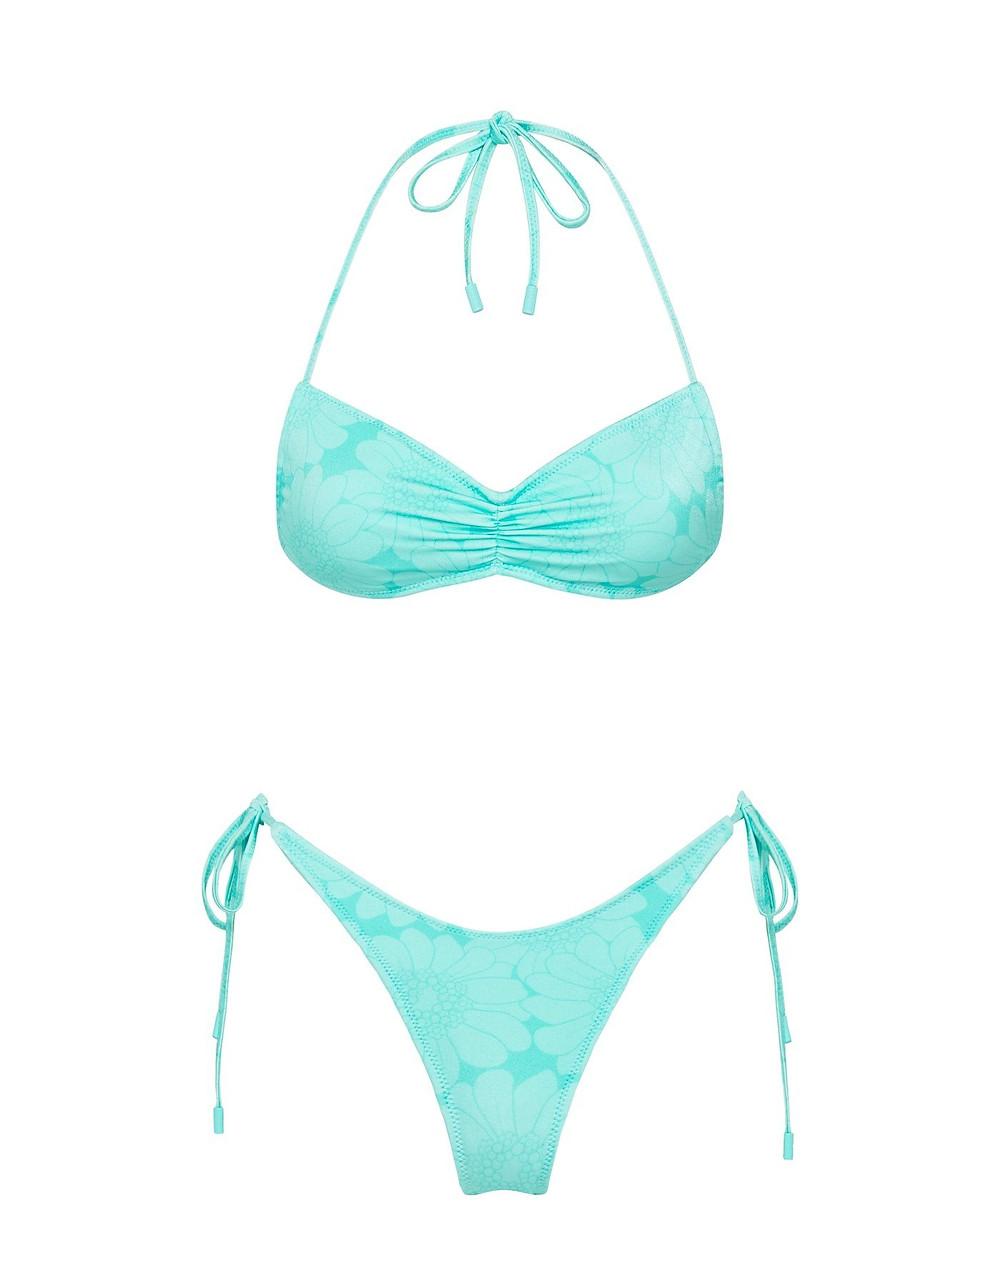 Greta Teal Floral Bikini Set by TRIANGL